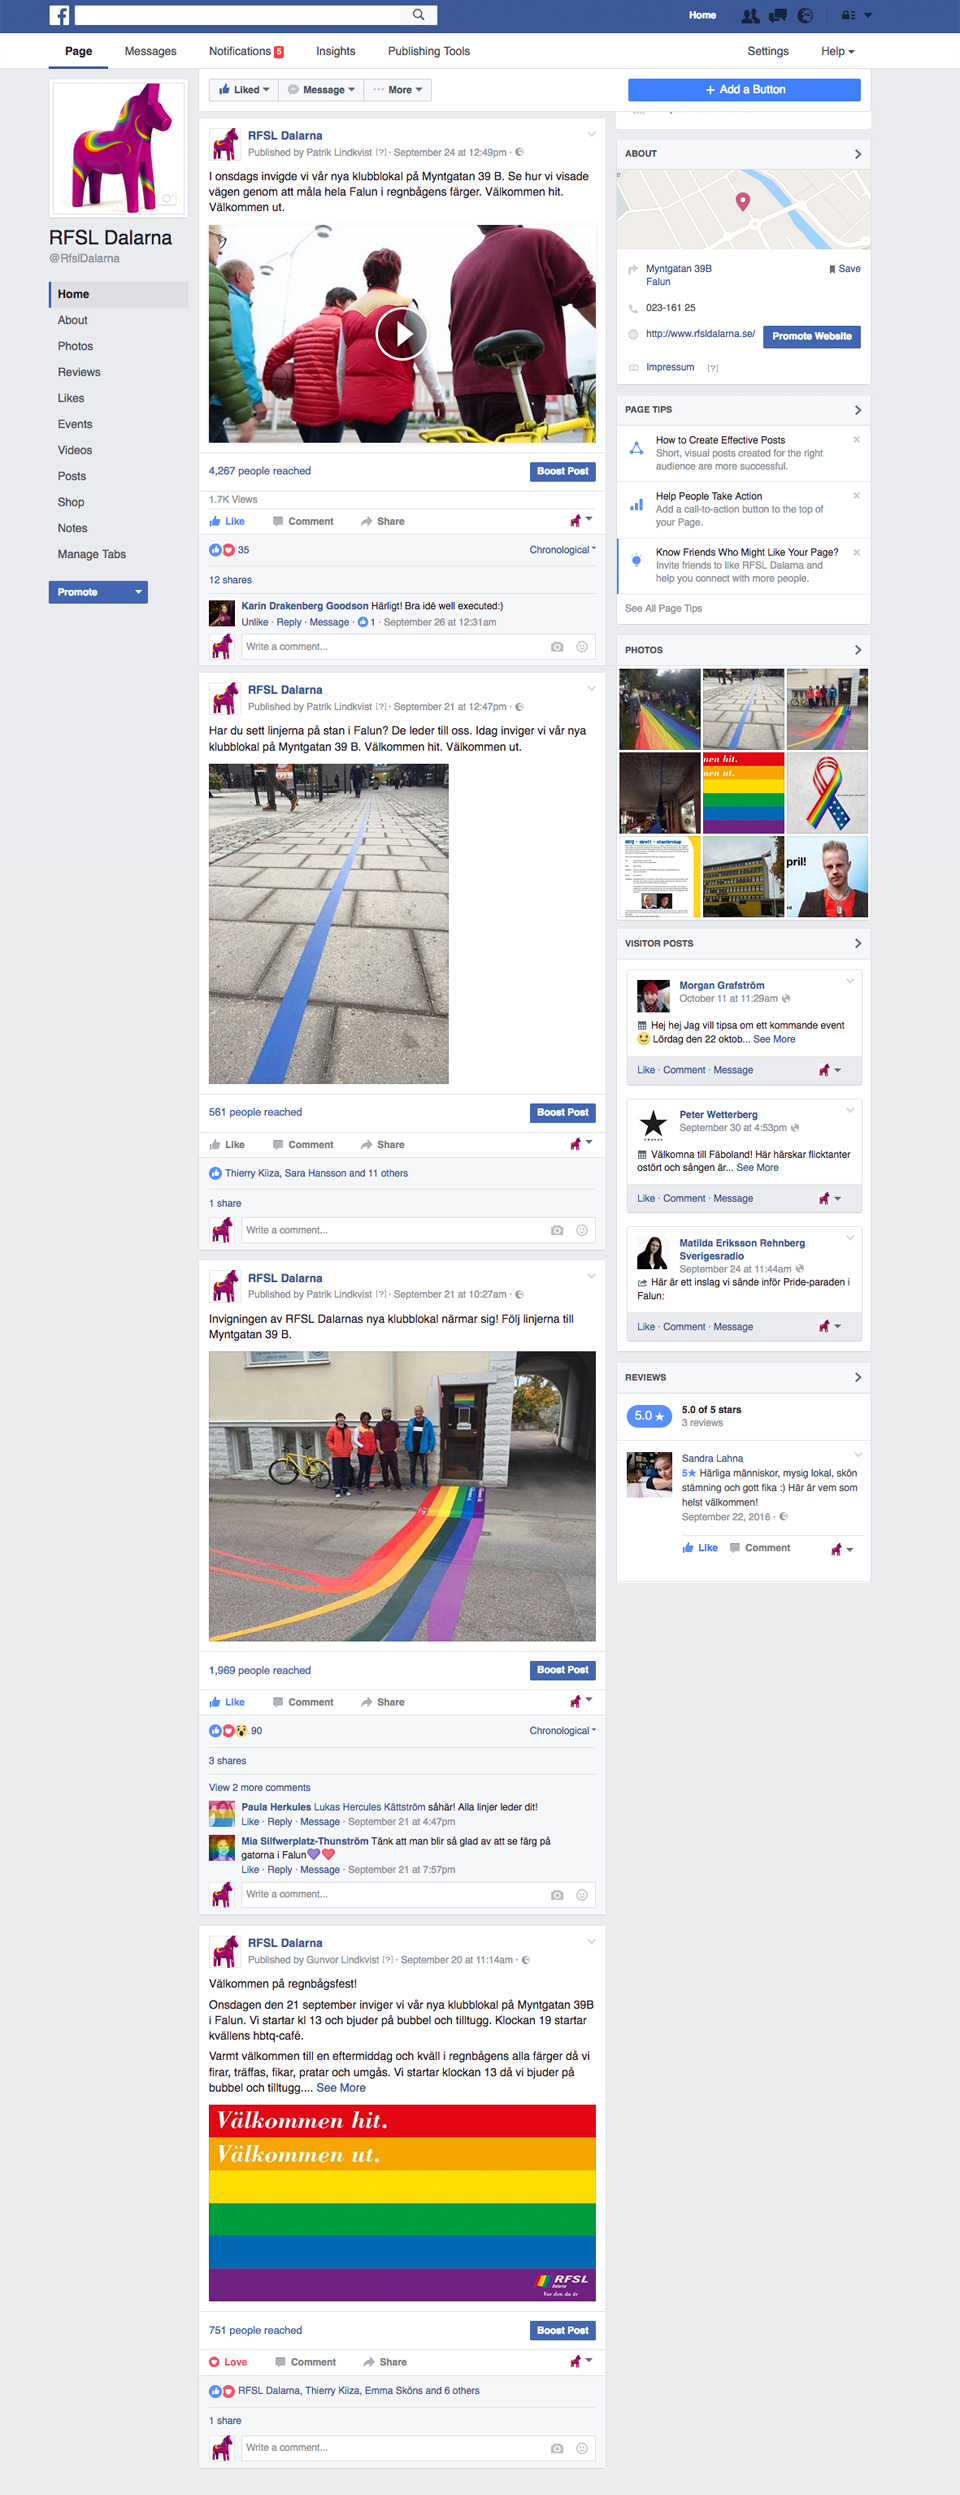 RFSL Dalarna Facebook